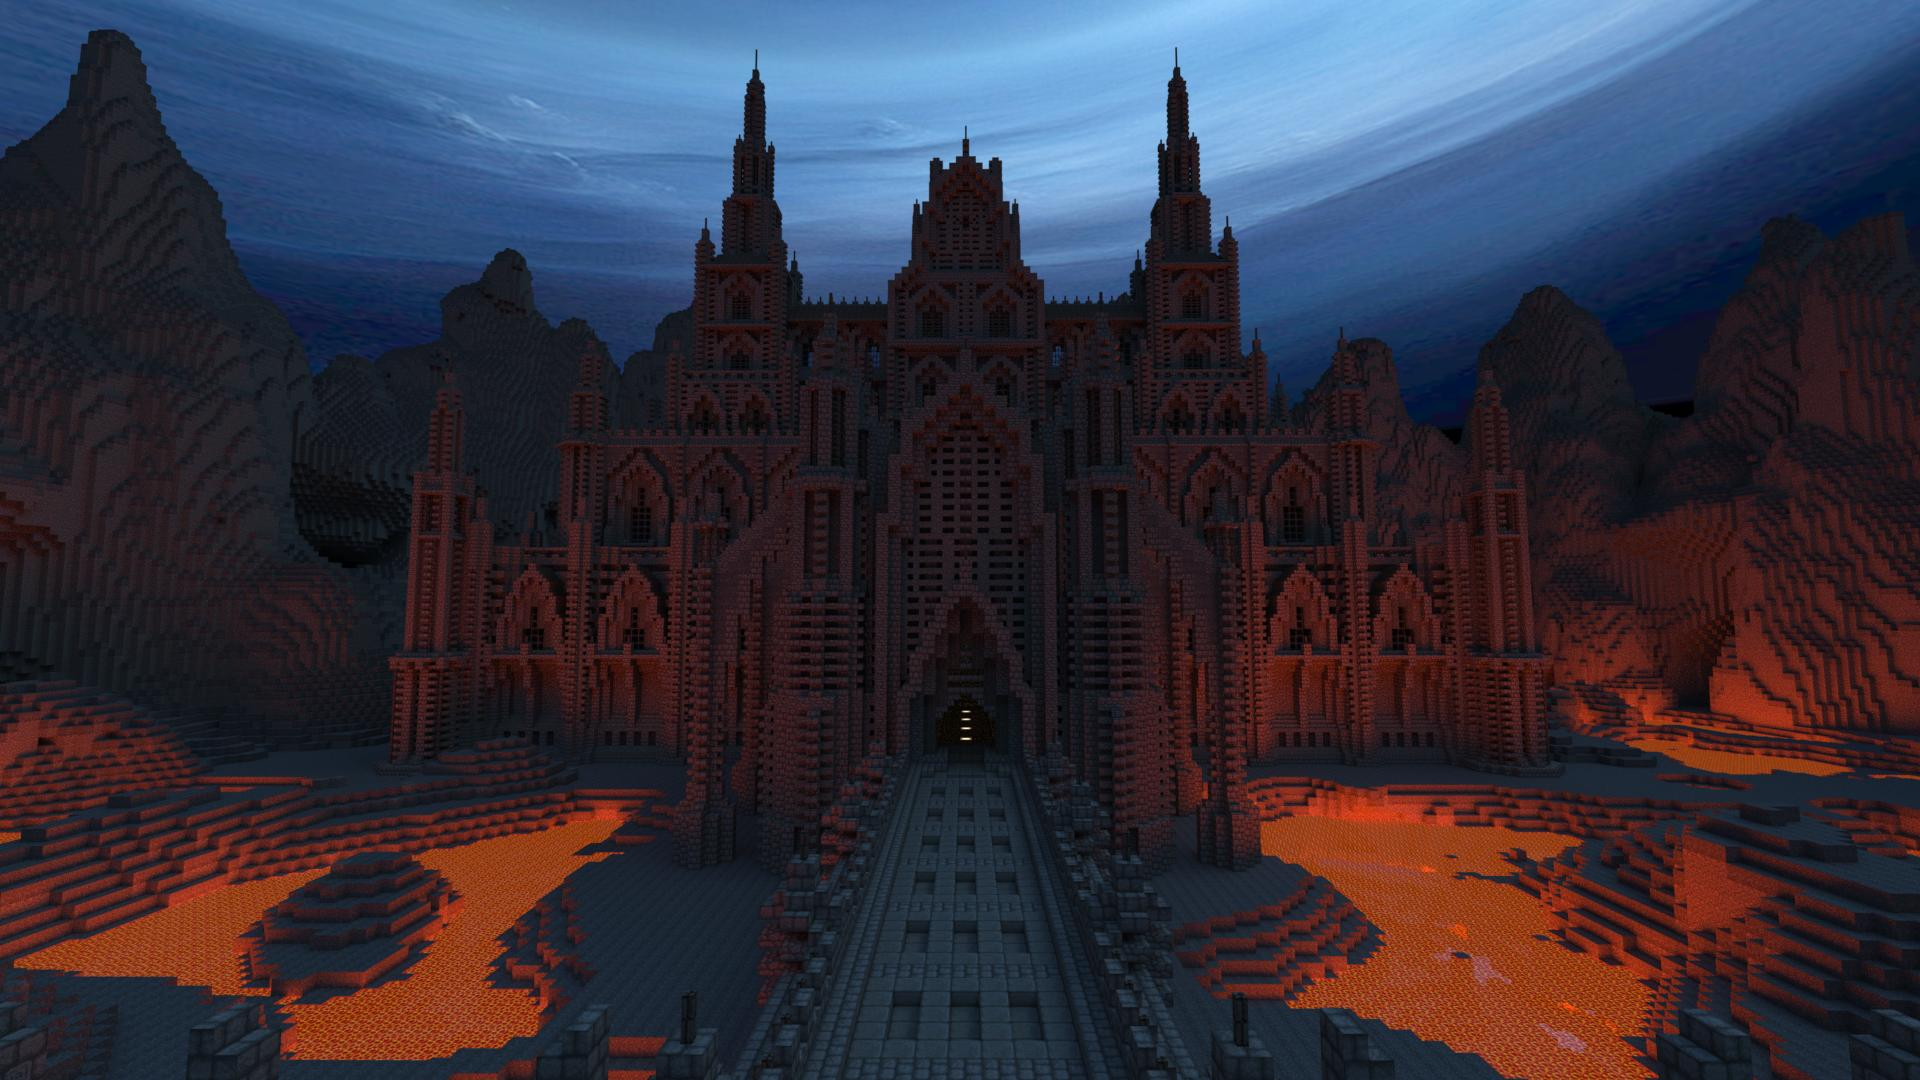 Fond d'écran Minecraft : Forteresse